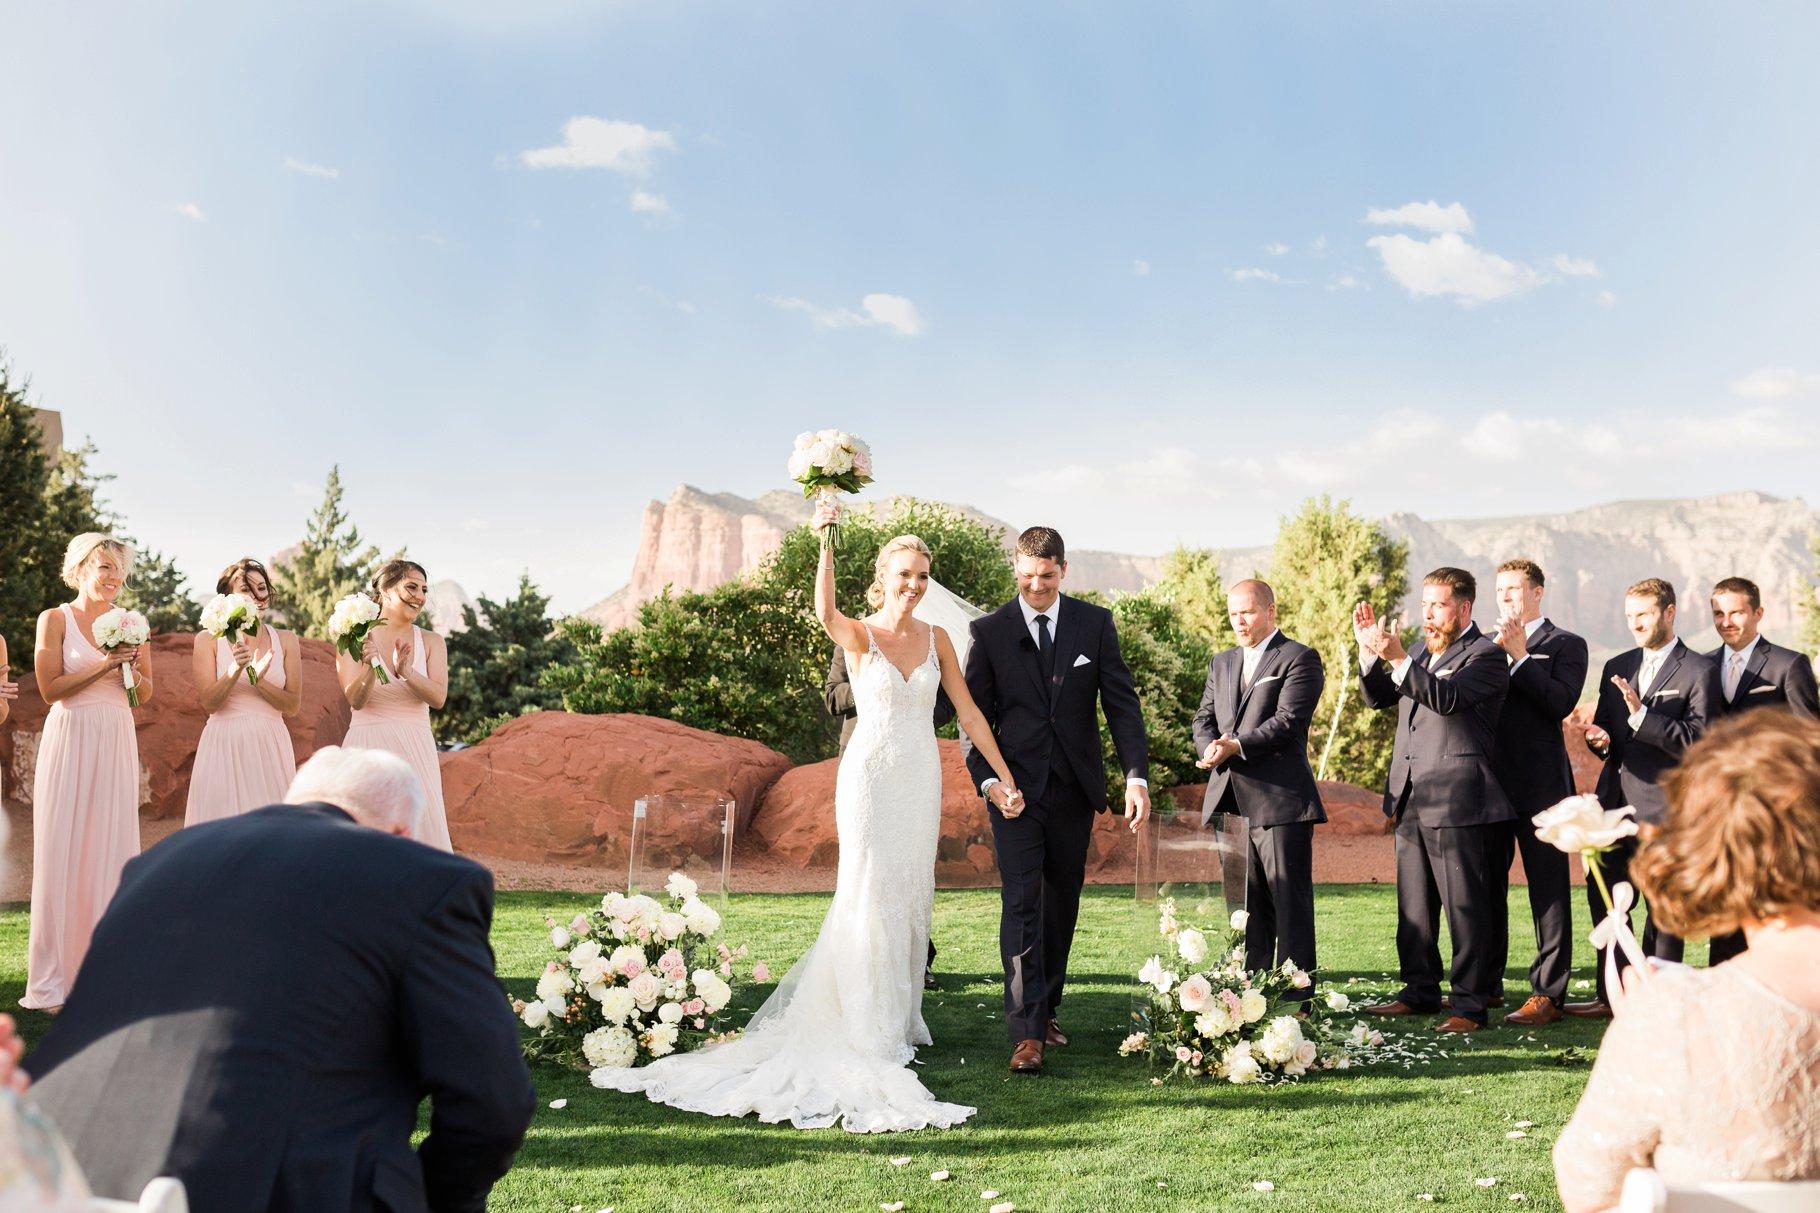 sedona wedding-12_GRETCHEN WAKEMAN PHOTOGRAPHY.jpg